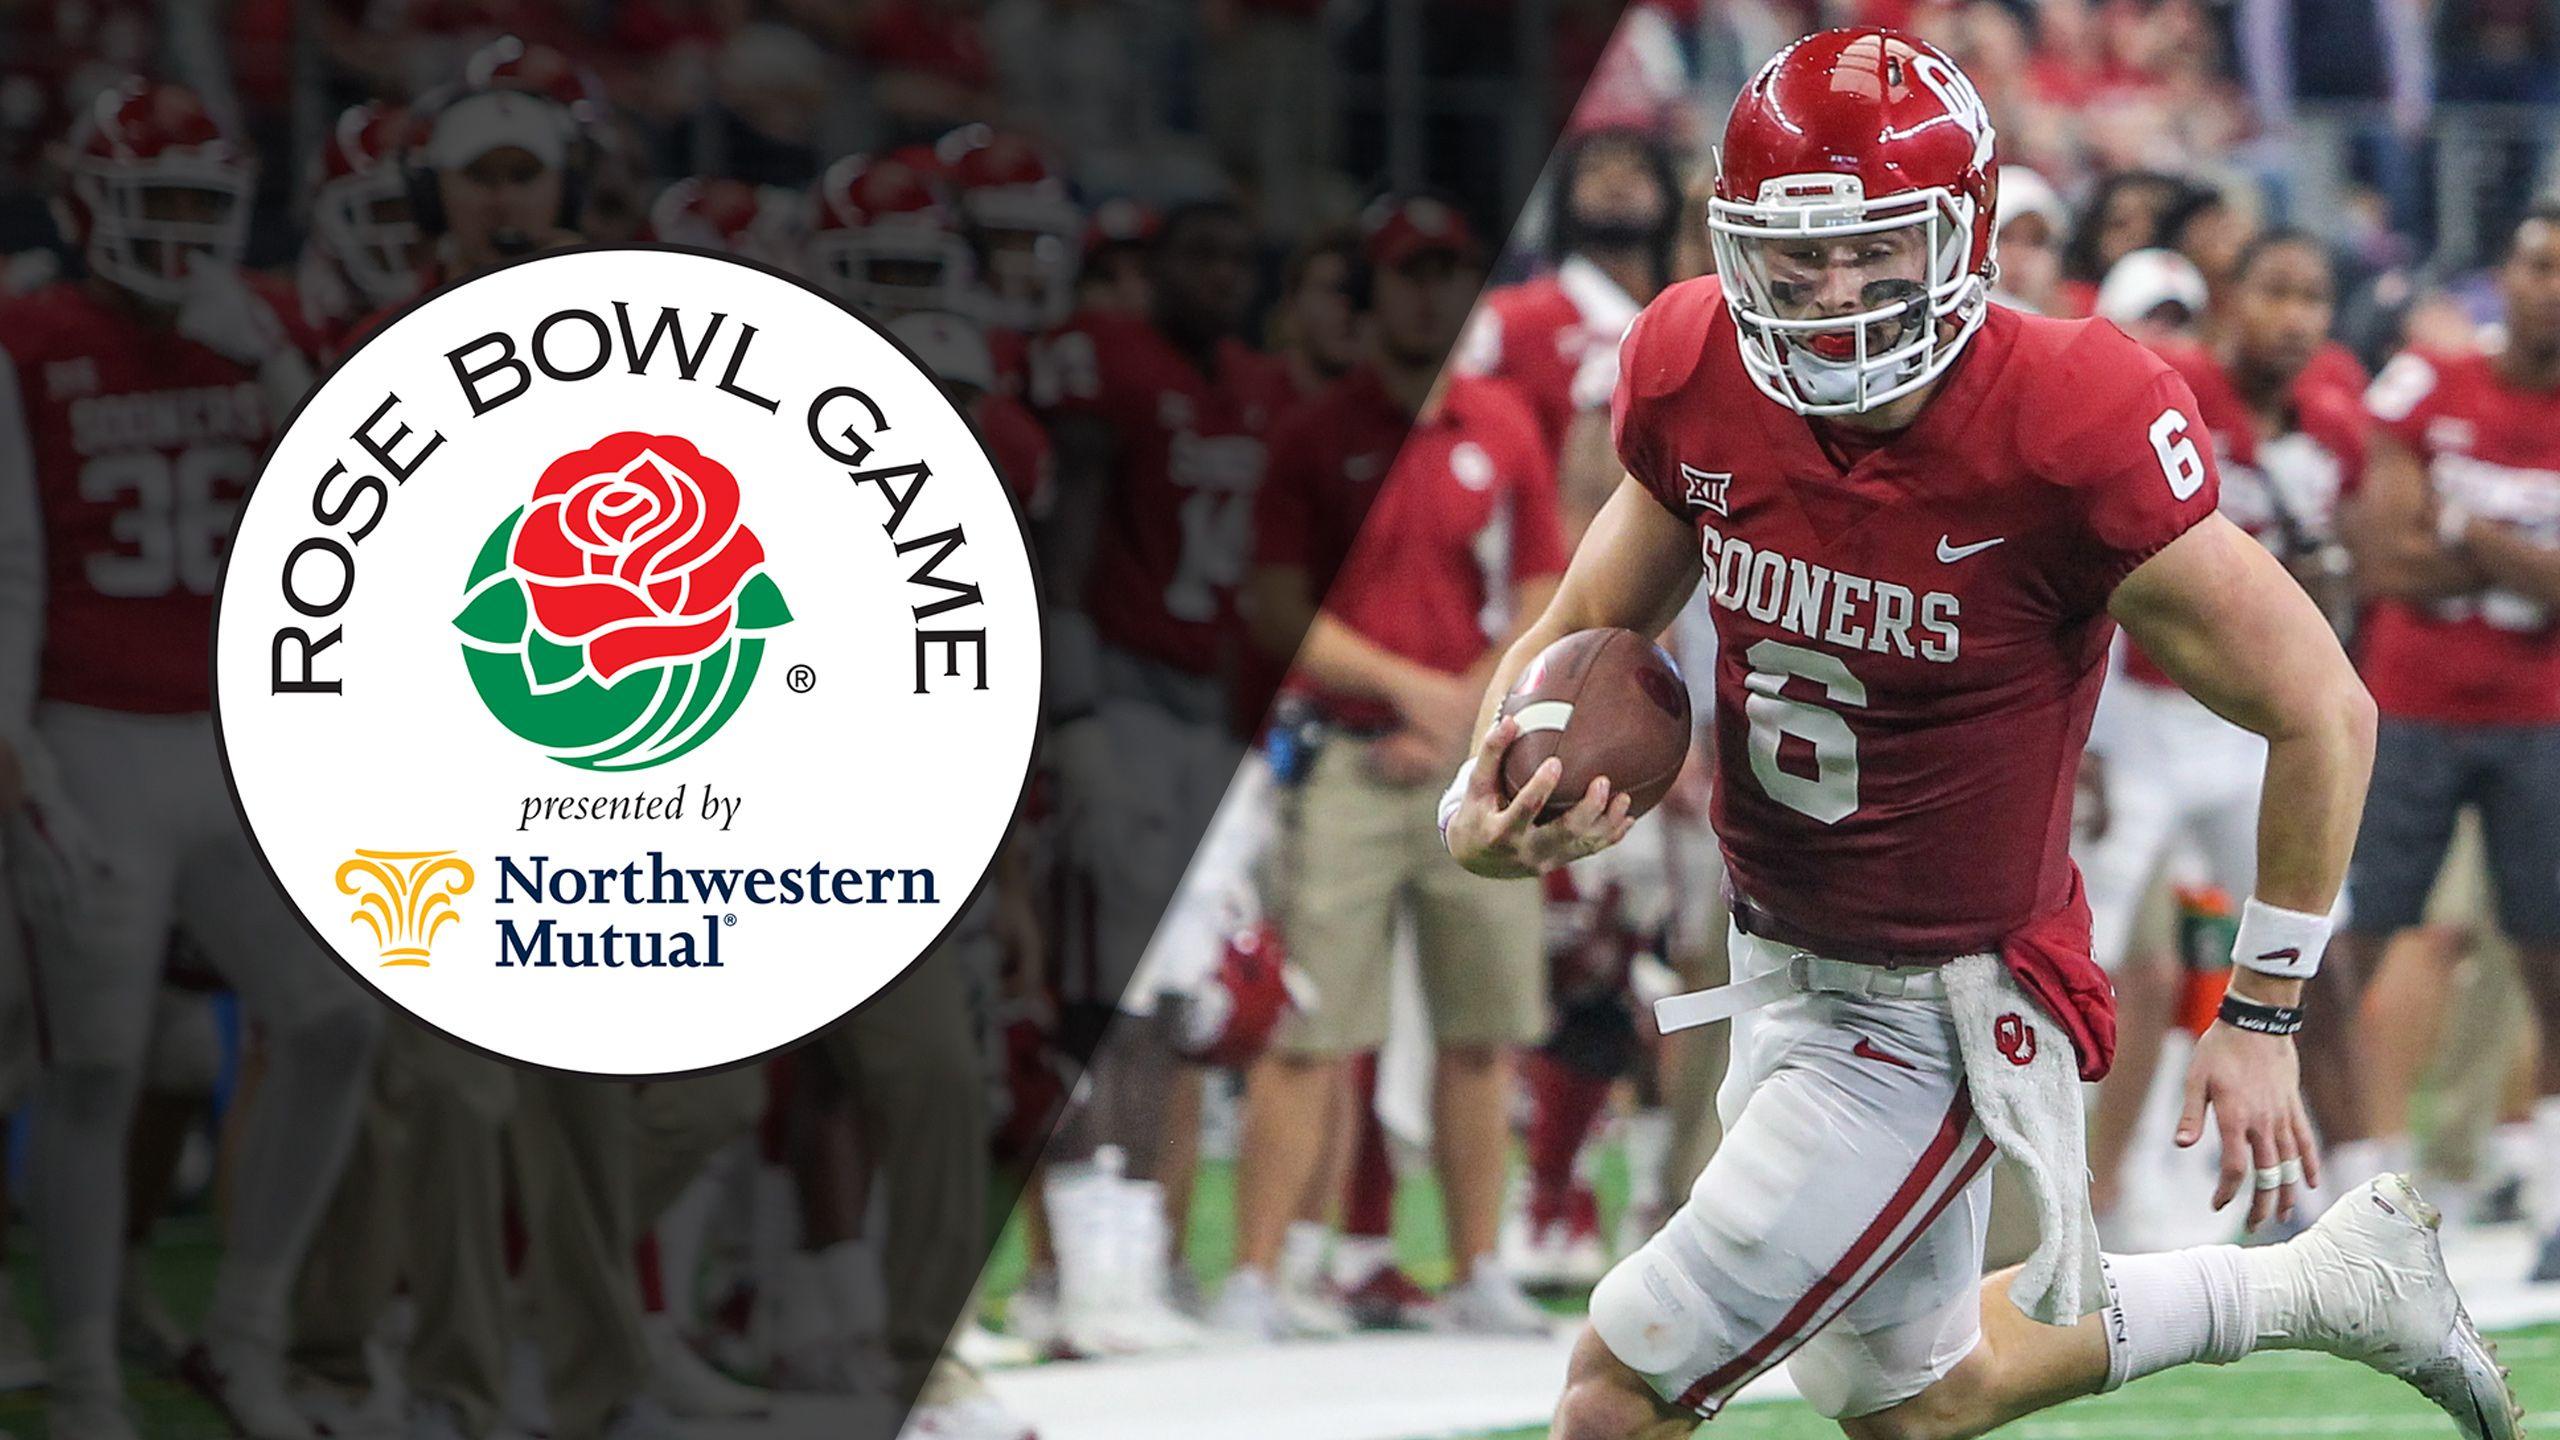 Oklahoma Hometown Radio: 2018 CFP Semifinal at the Rose Bowl Game Presented by Northwestern Mutual